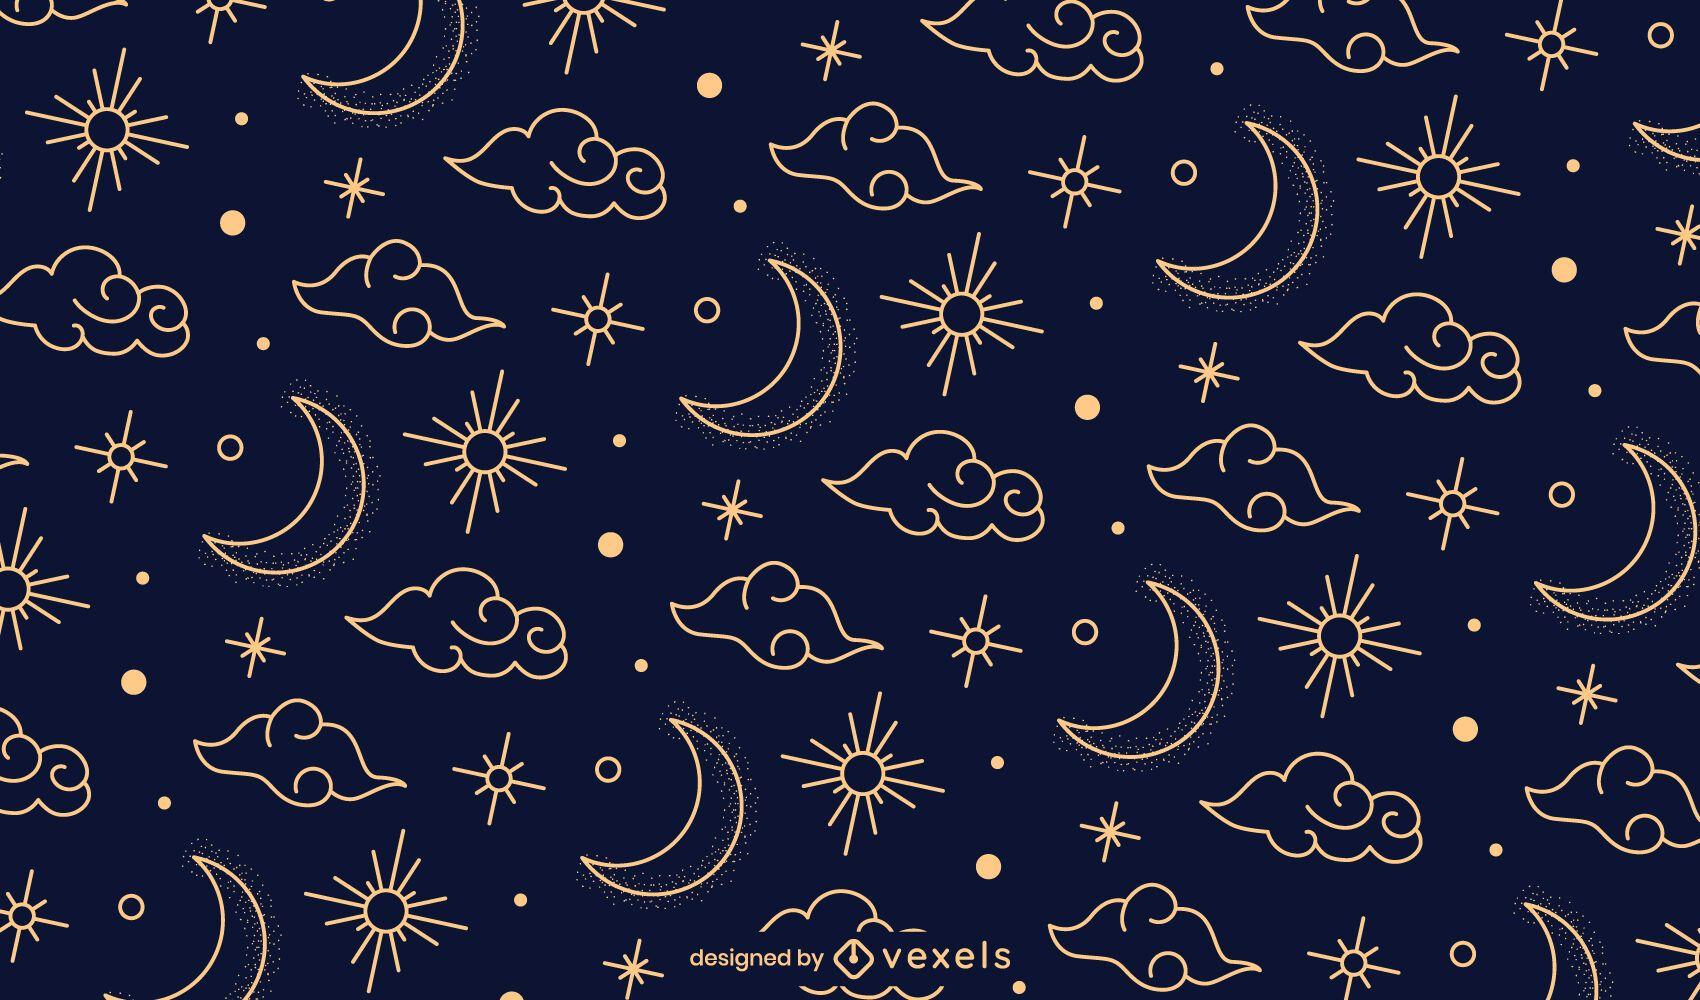 Night chinese pattern design